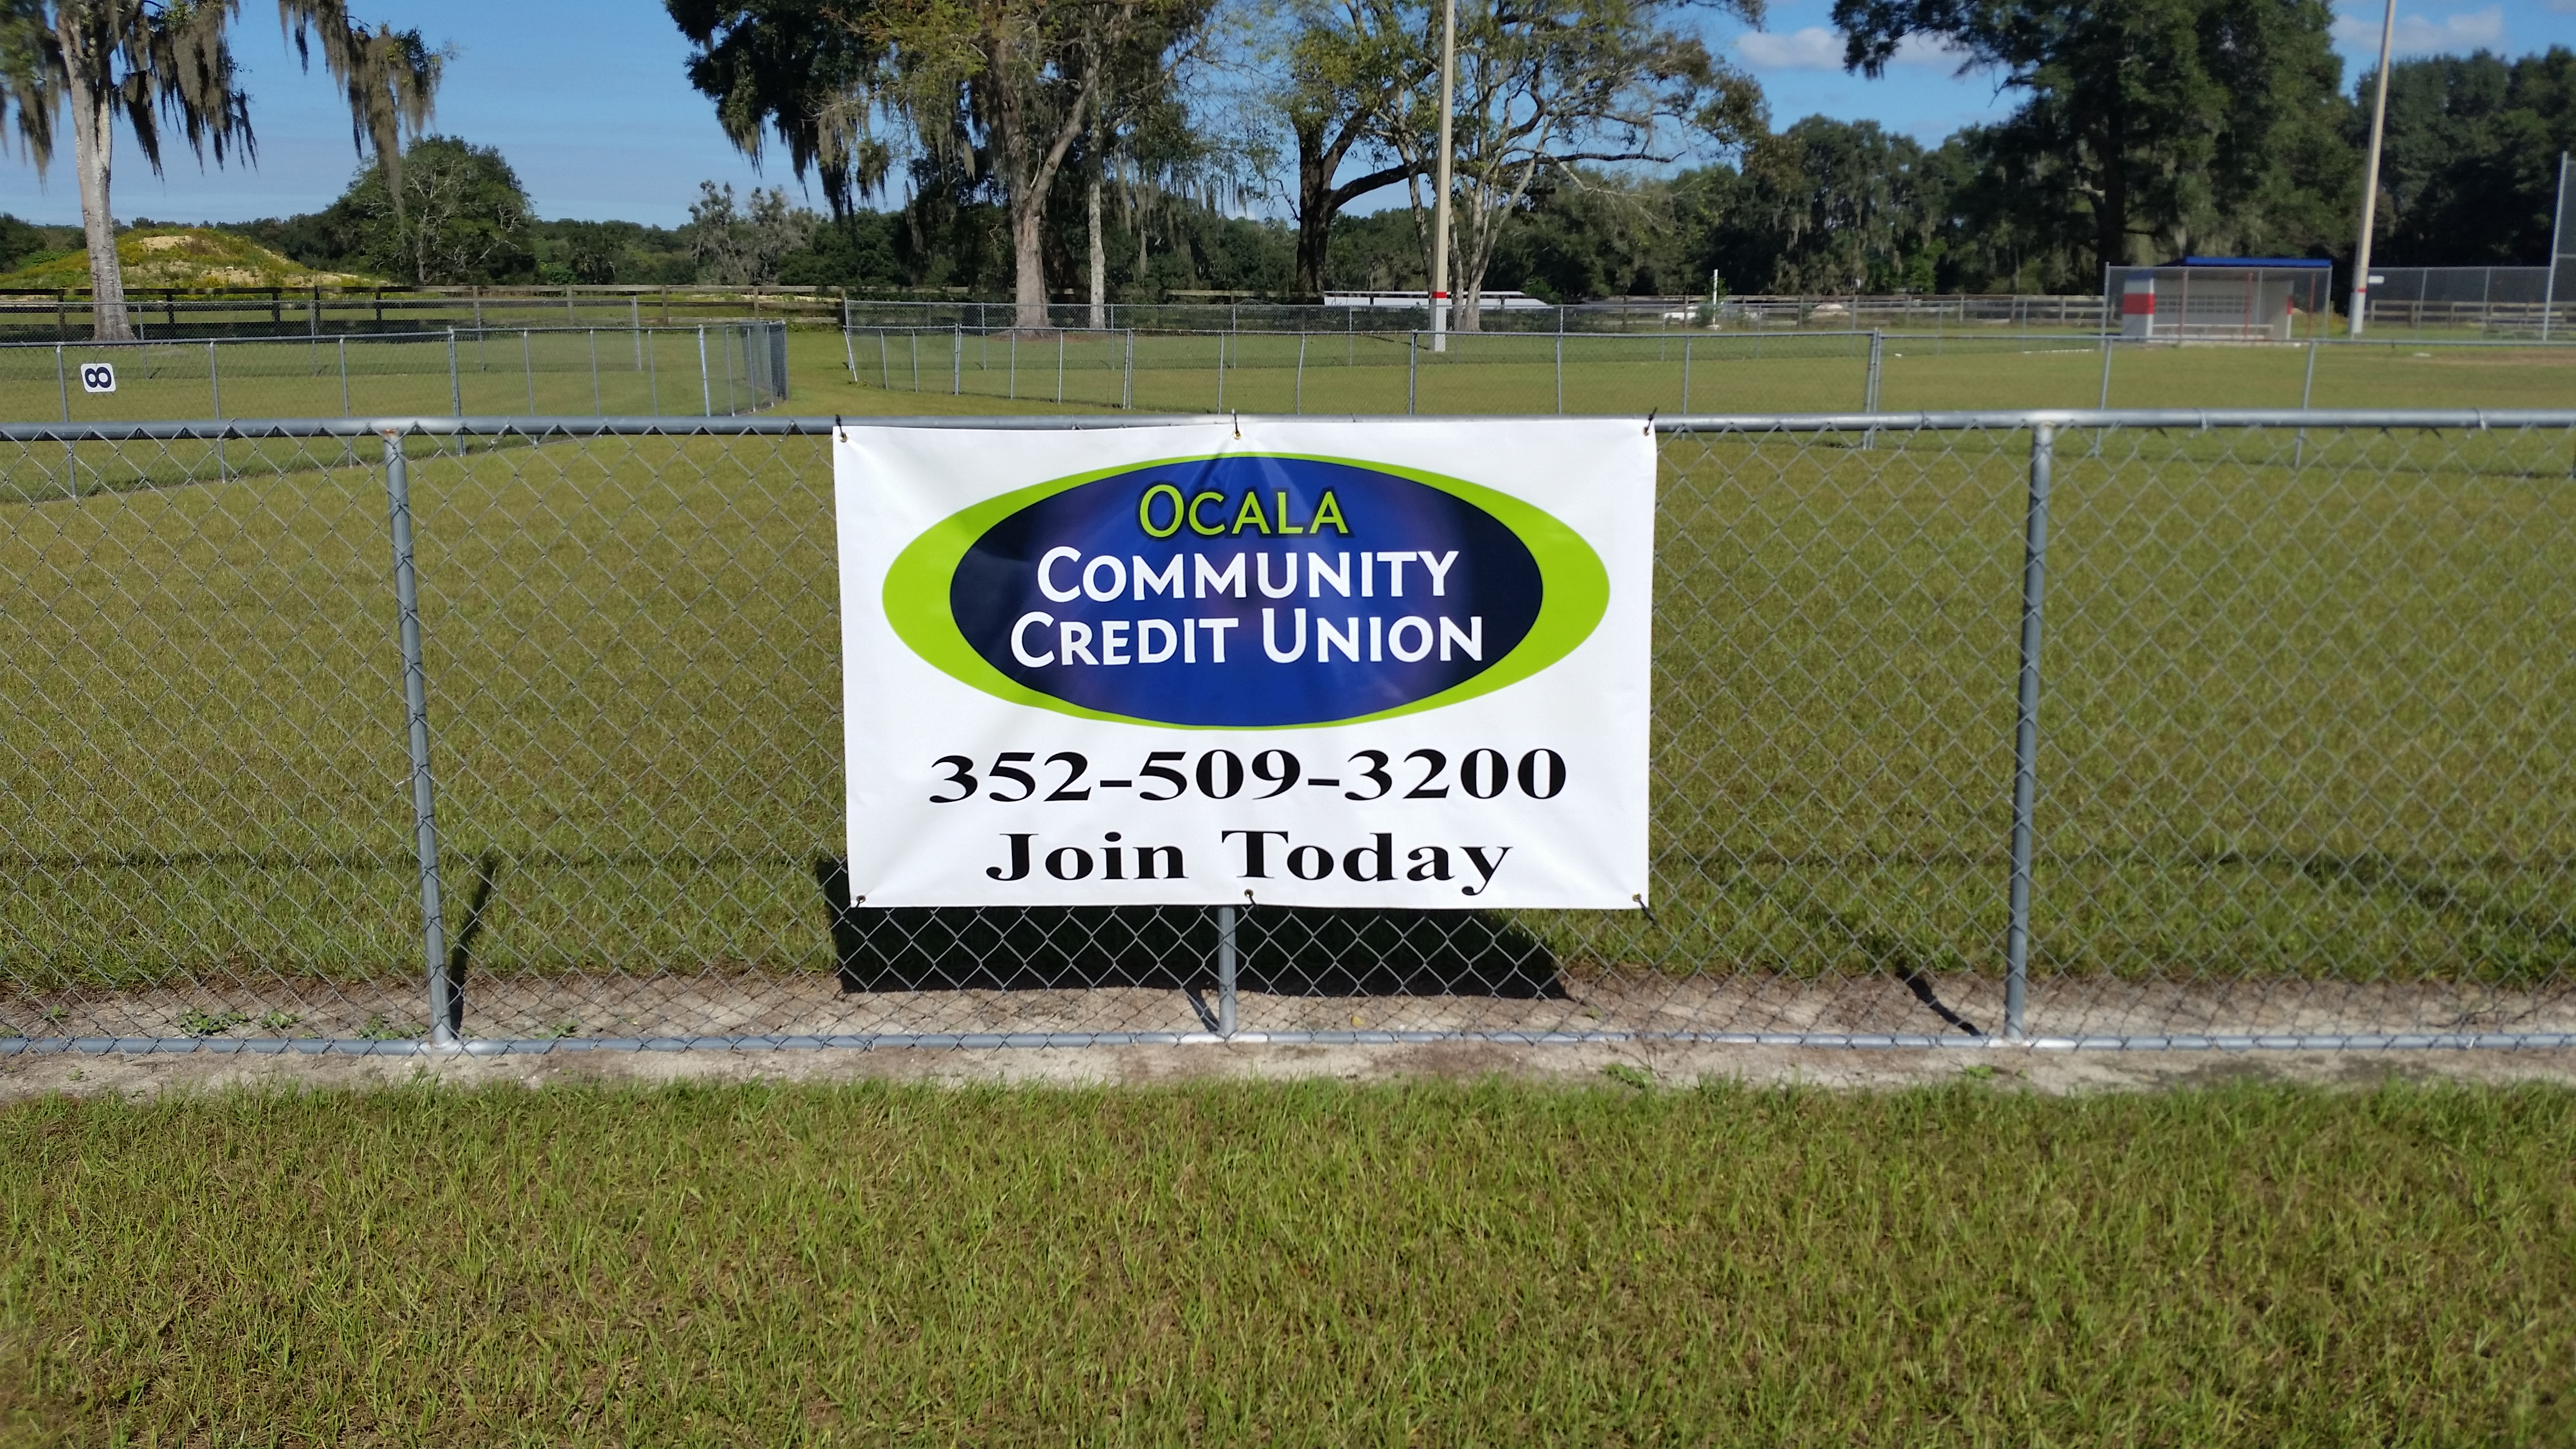 11-01-2015 Field Sponsorship-Oak-Griner Youth Baseball Sign